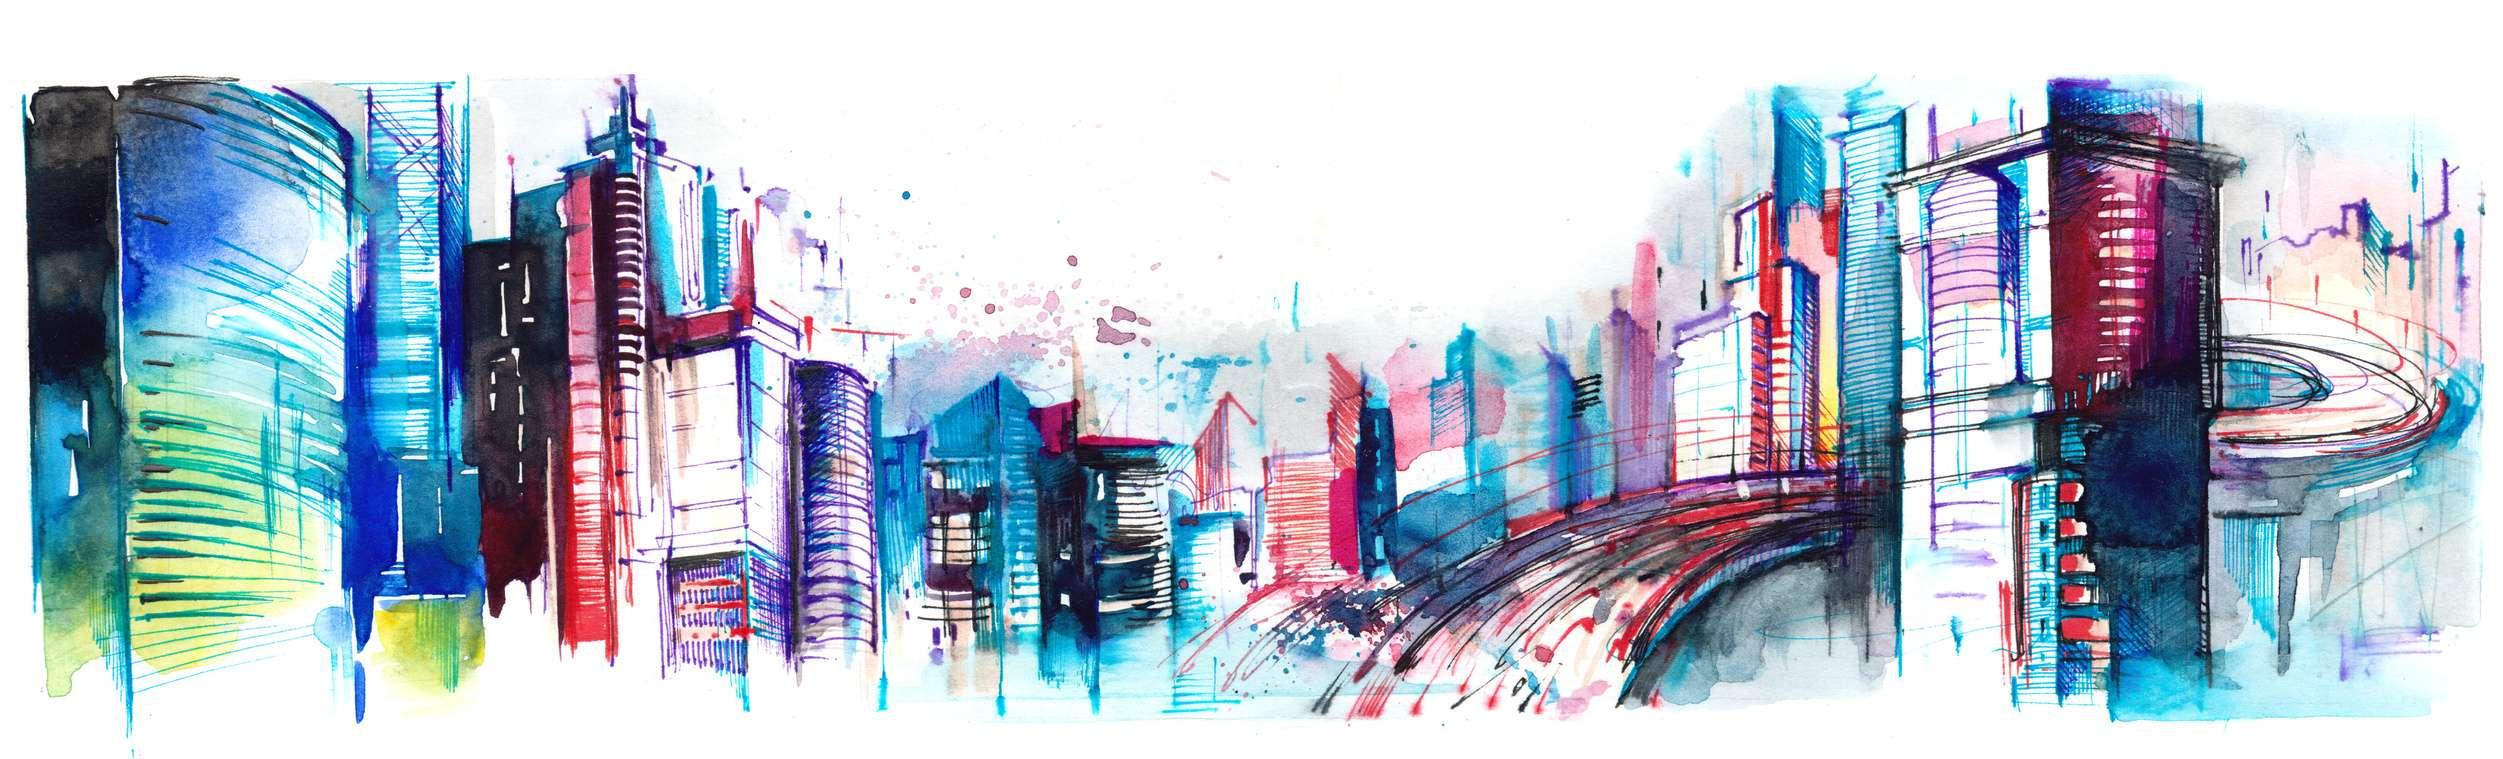 panorama of city